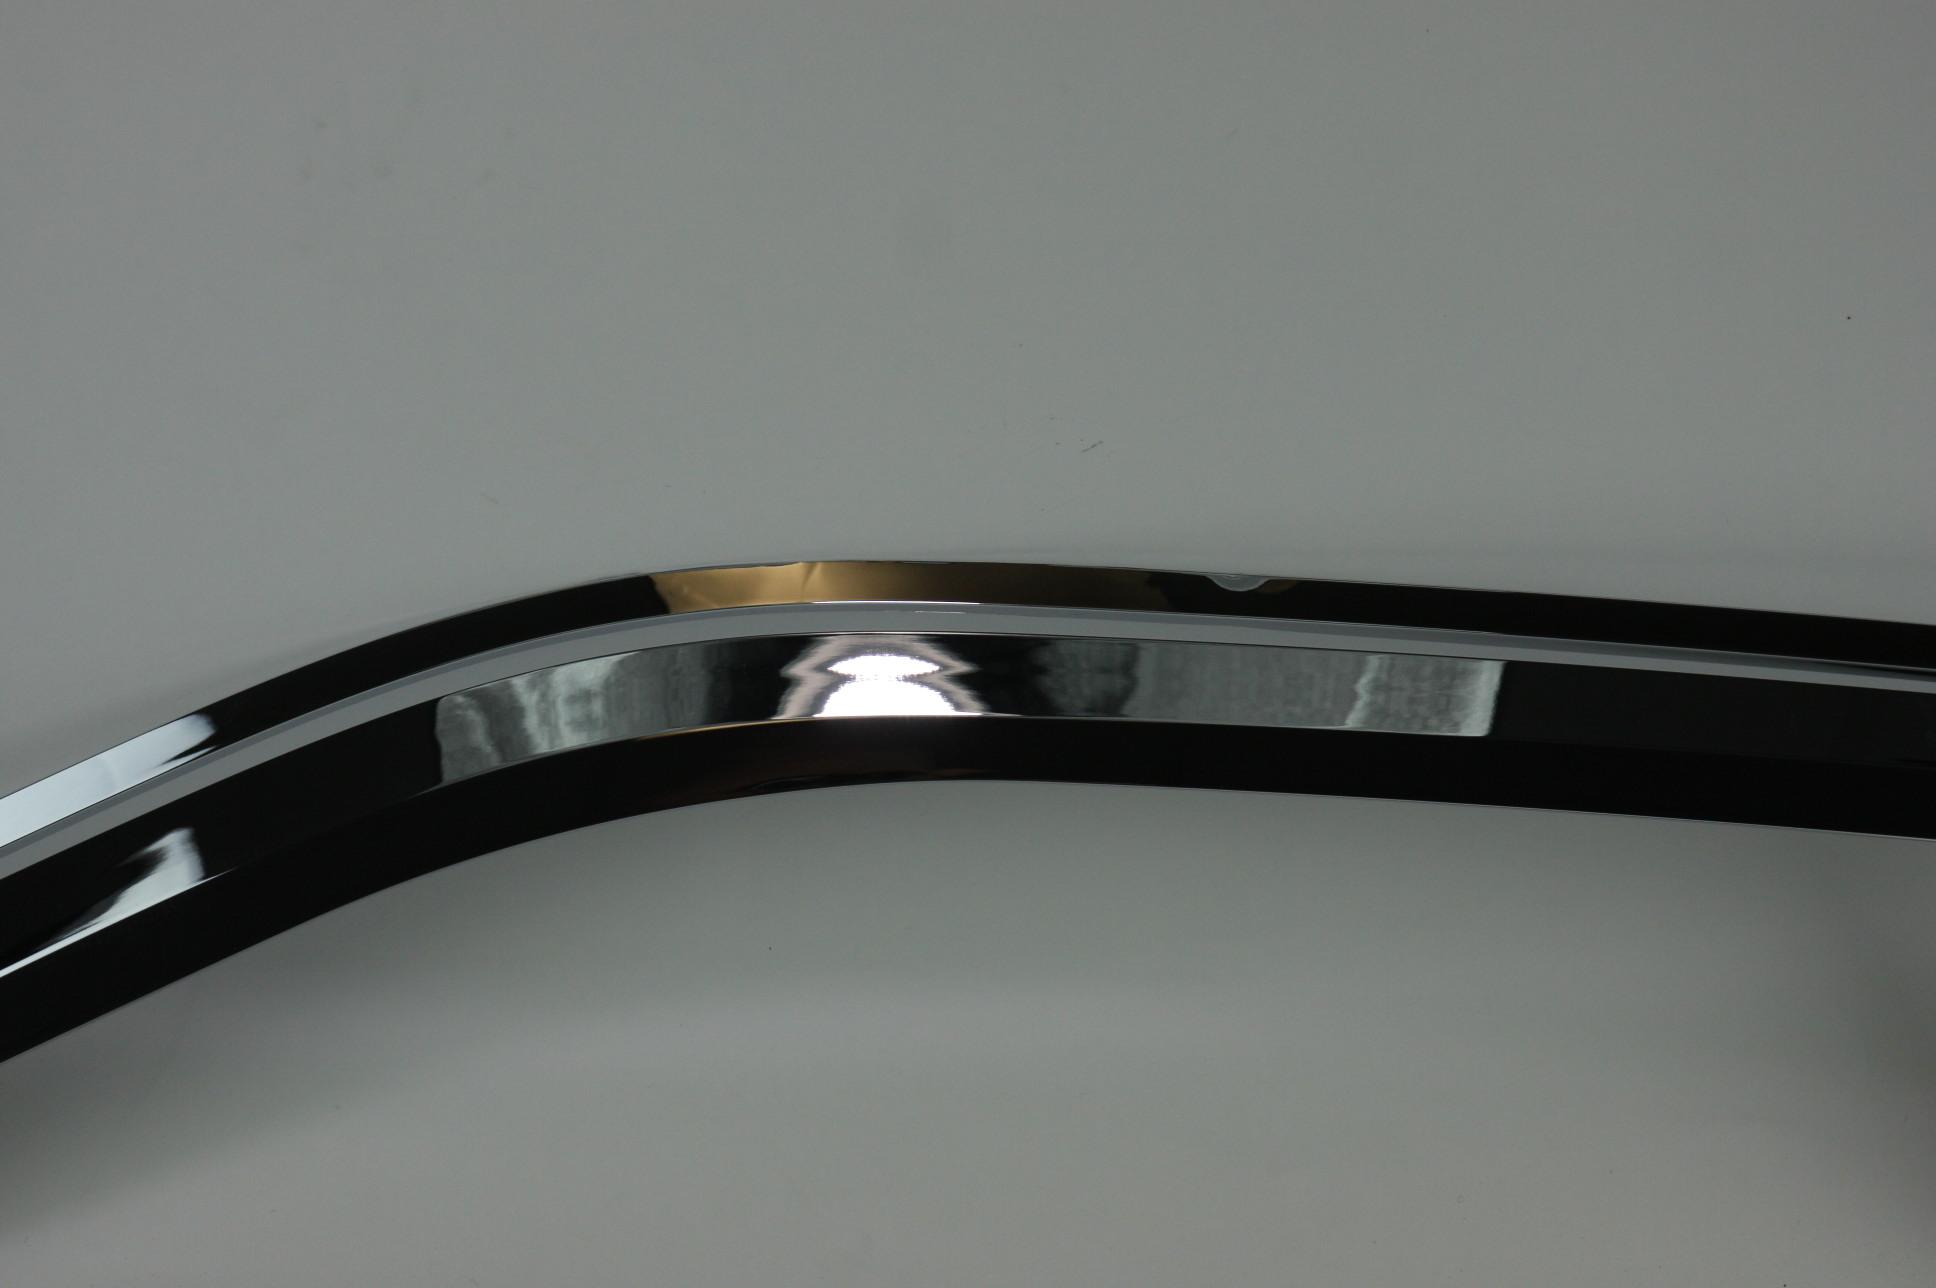 ~ New OEM VFL3Z18246C Genuine Ford Chrome Air Deflectors Side Windows - image 4